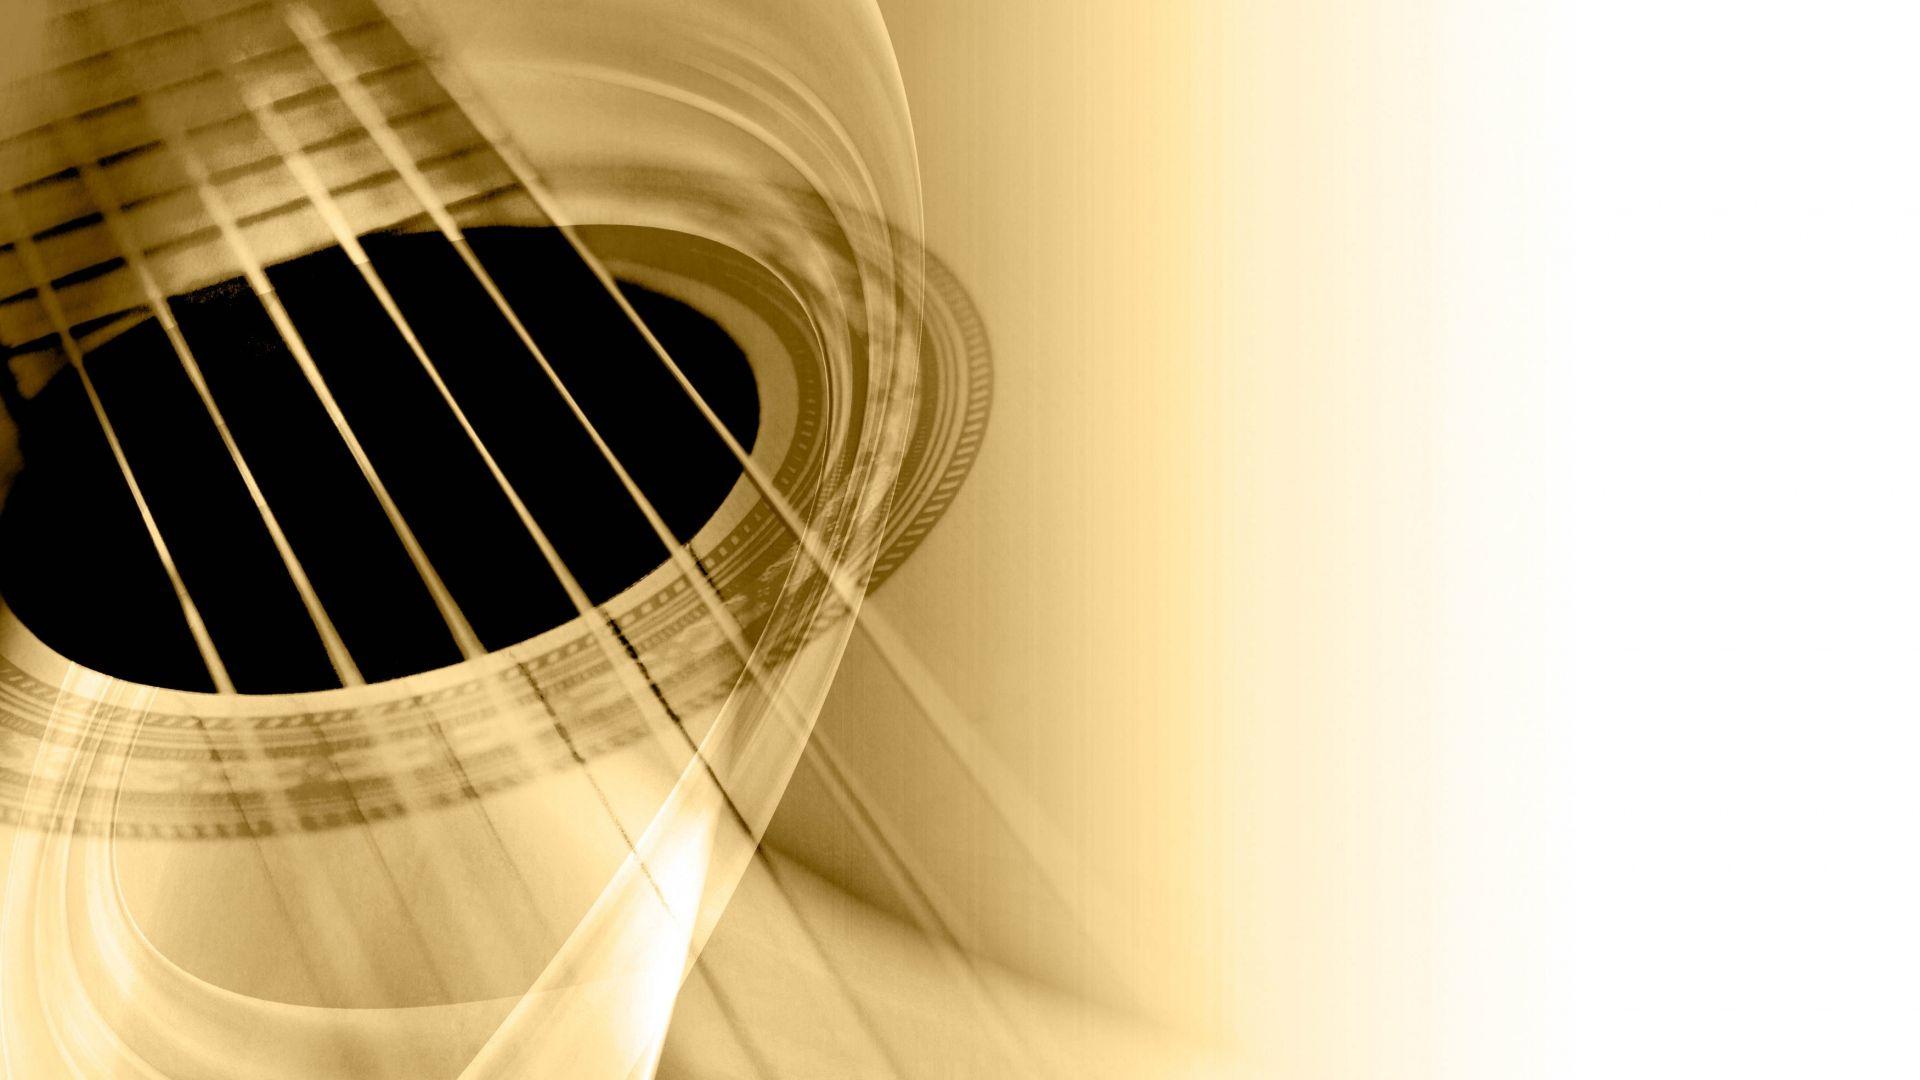 free fine classic guitar wallpaper